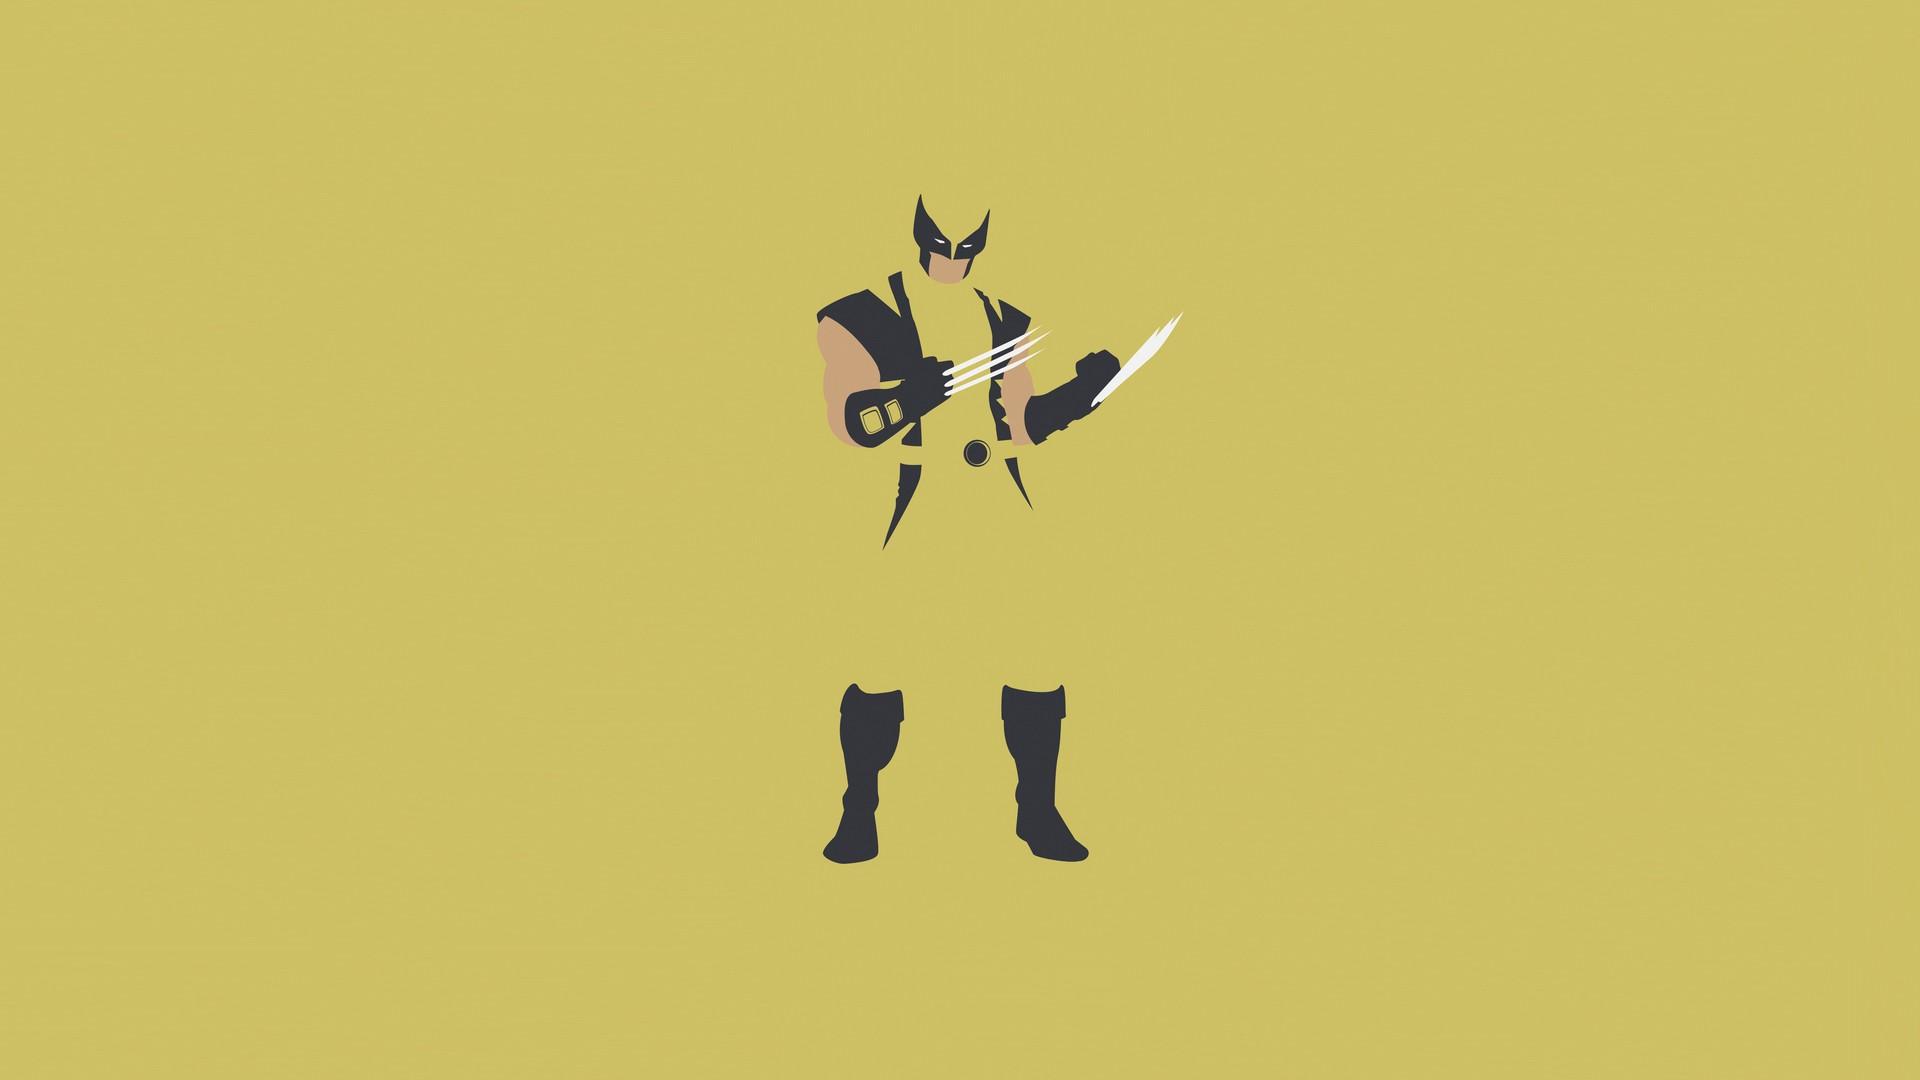 Free Download Minimalist Wolverine Wallpaper Yellow Marvel Comics X Men 1920x1080 For Your Desktop Mobile Tablet Explore 45 Minimalist Marvel Wallpaper Marvel Characters Wallpaper Minimalist Hd Wallpaper Minimalist Wallpaper For Desktop